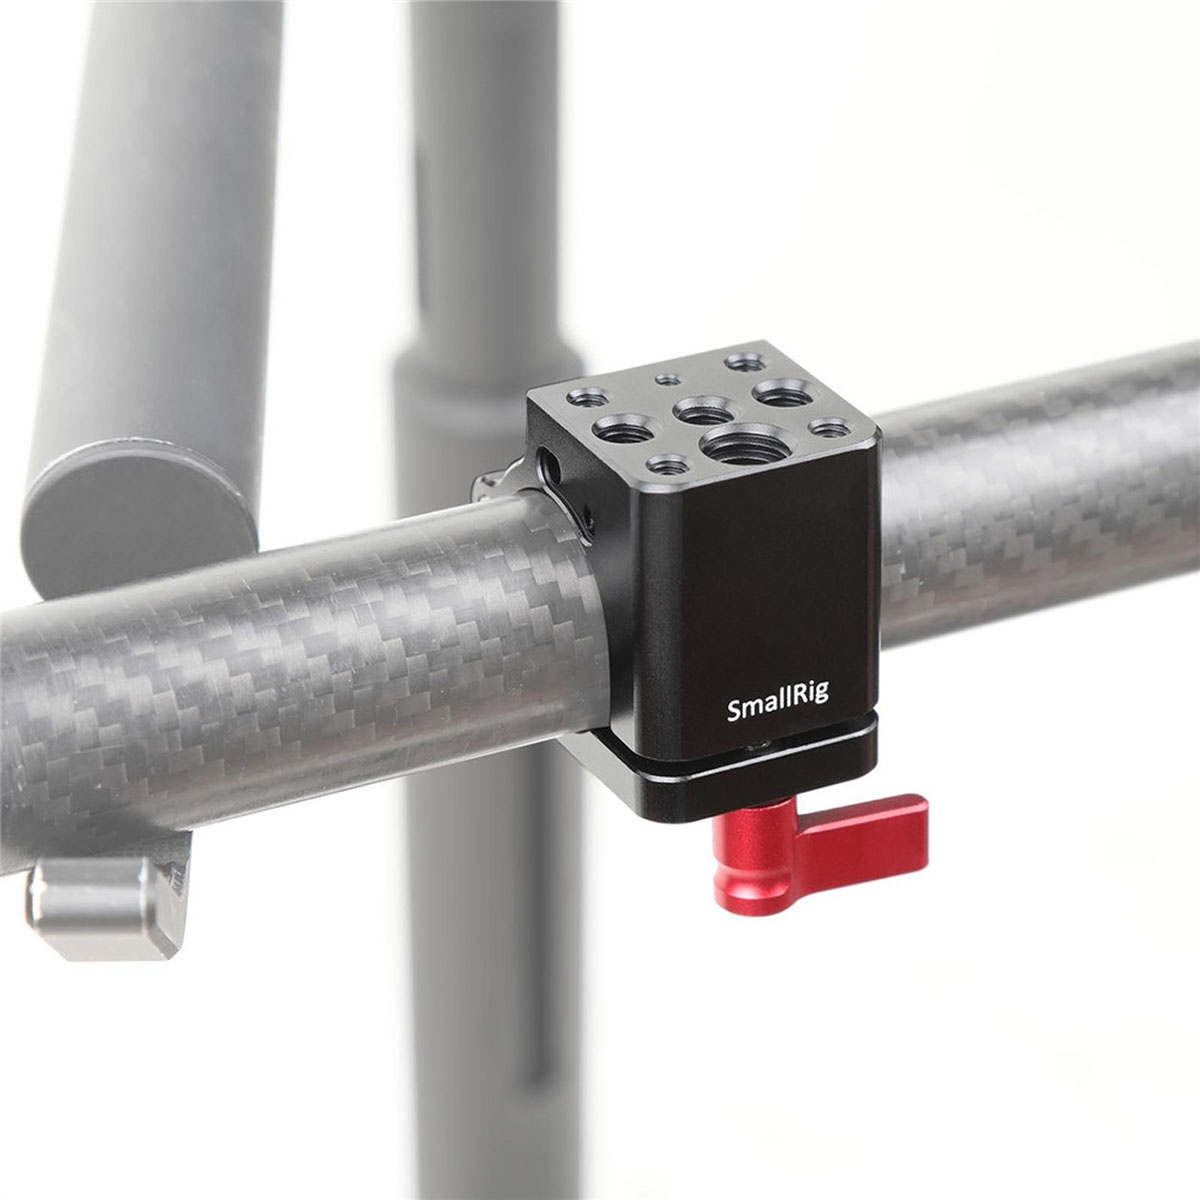 SmallRig 25mm Rod Clamp for DJI Ronin M/Ronin MX/Freefly MOVI (1860)